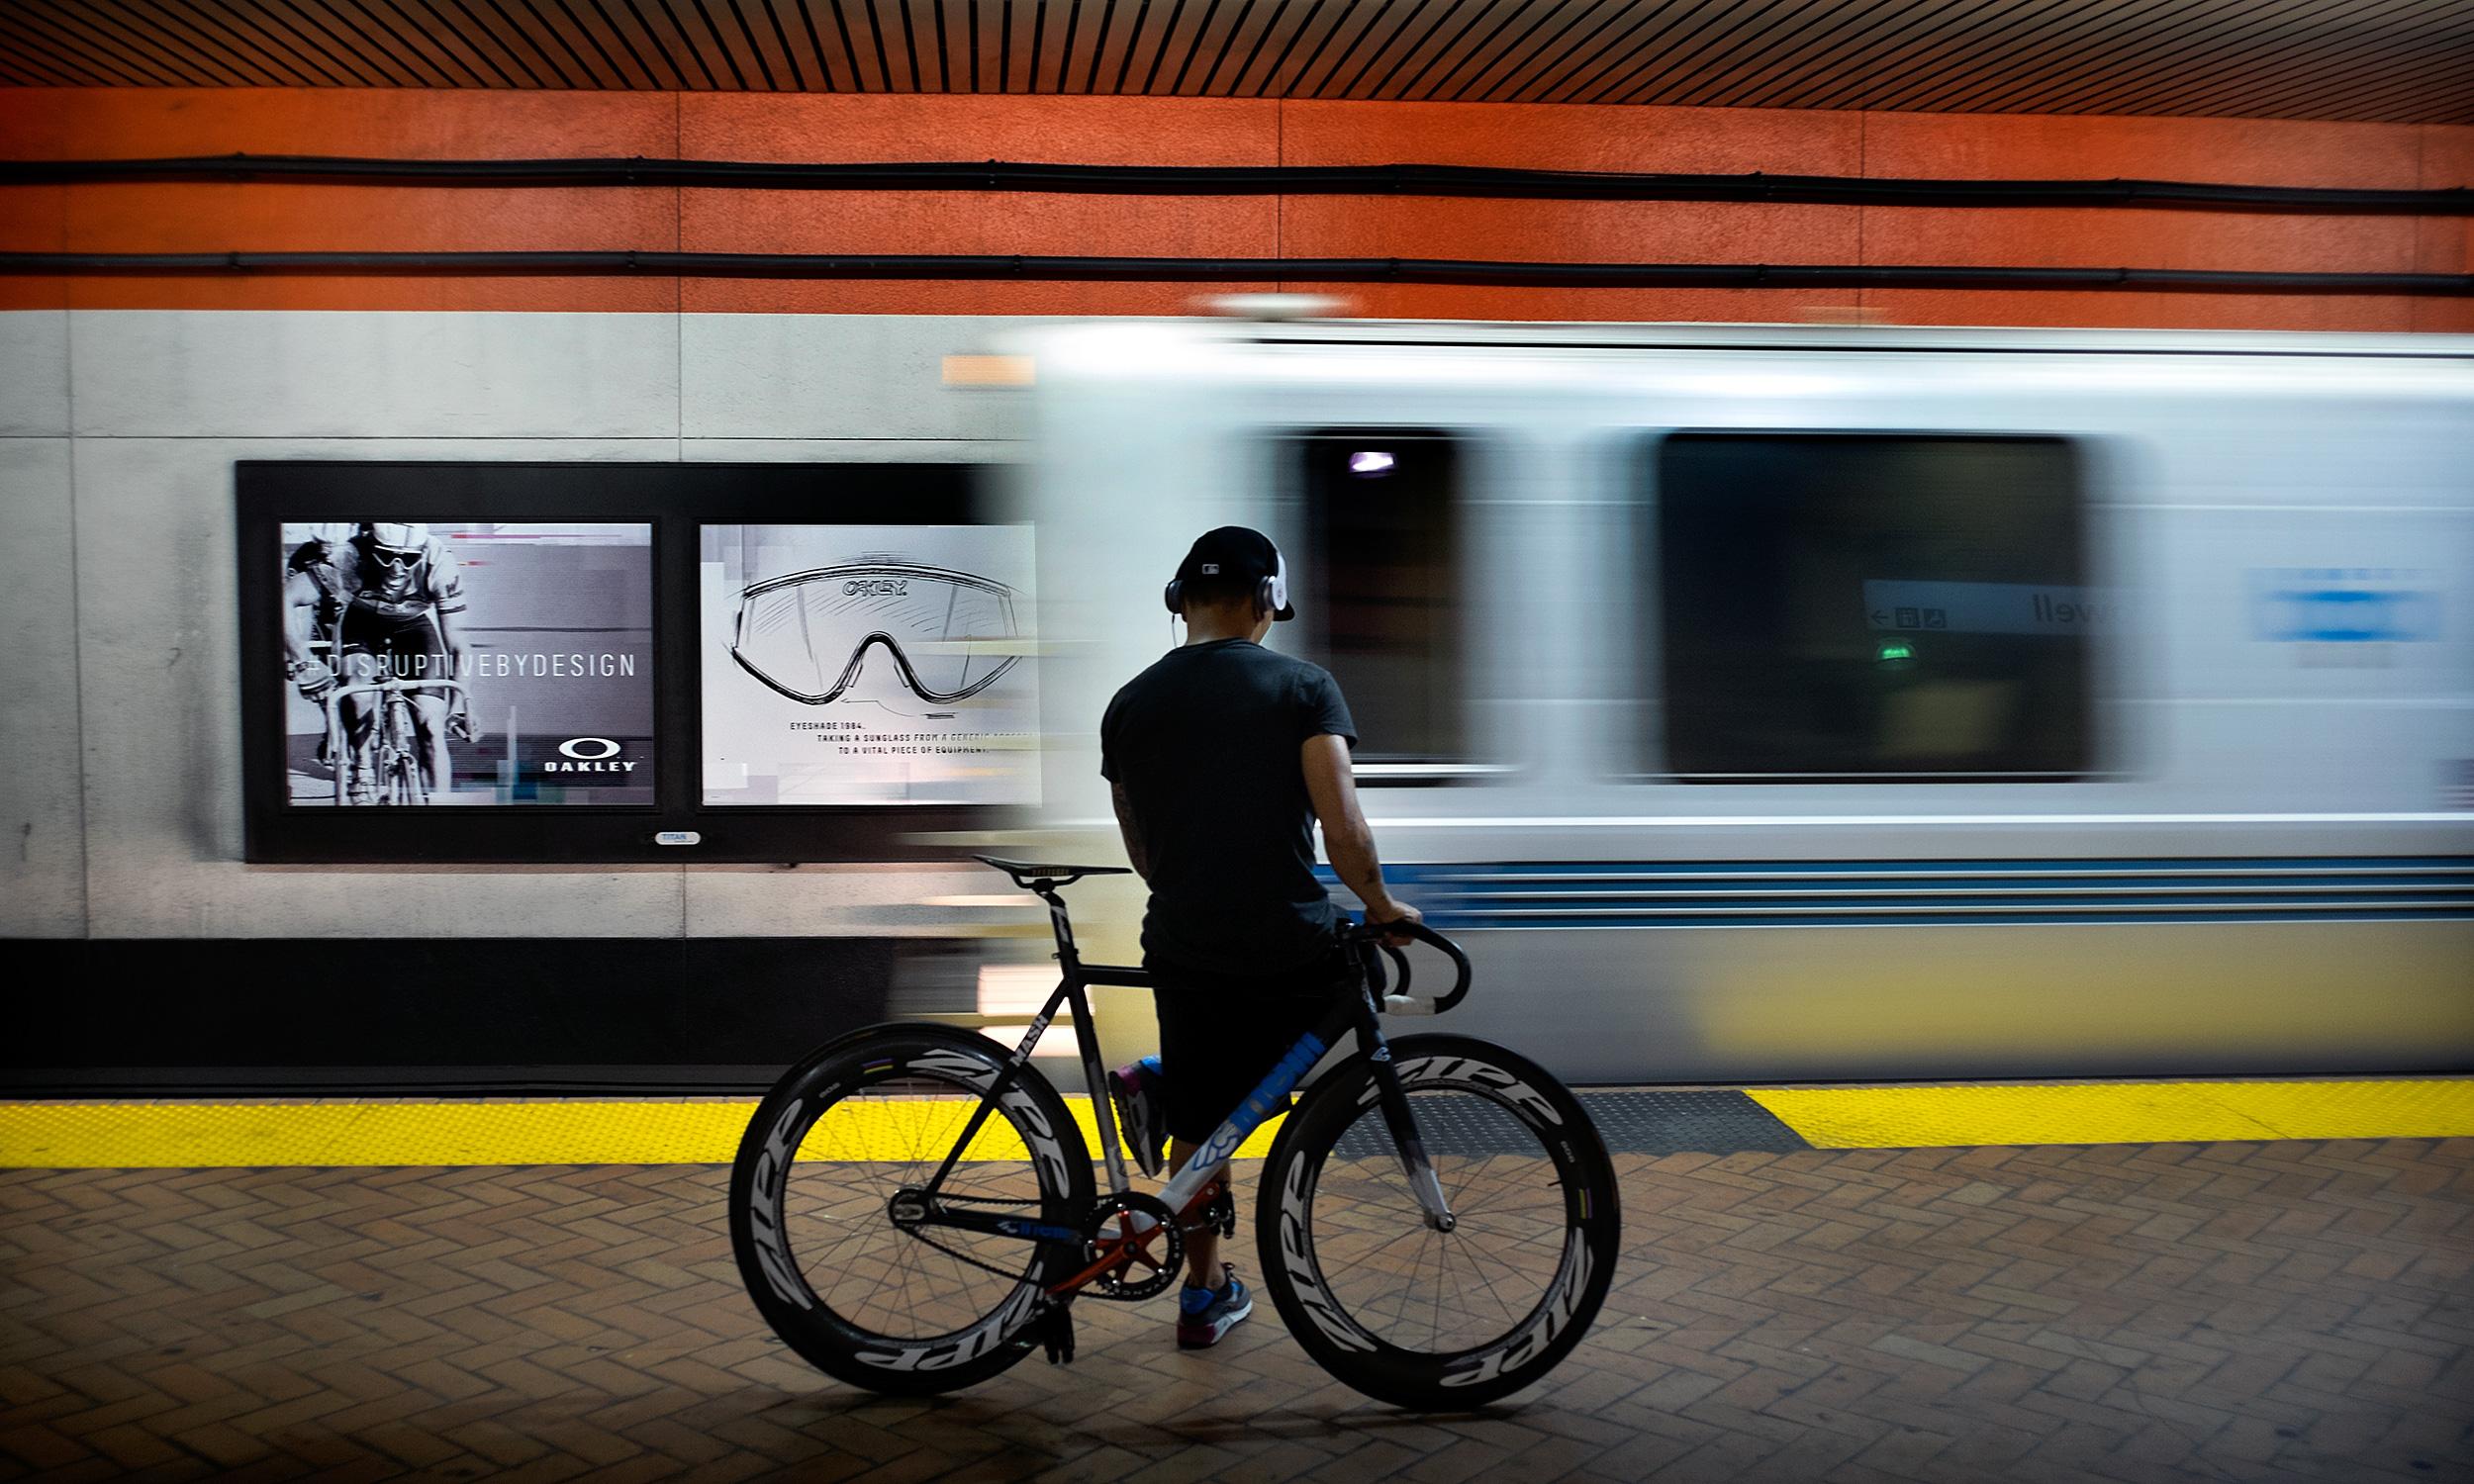 bart transit bike bicycle fixie commute commuting commuter zipp headphones bart train